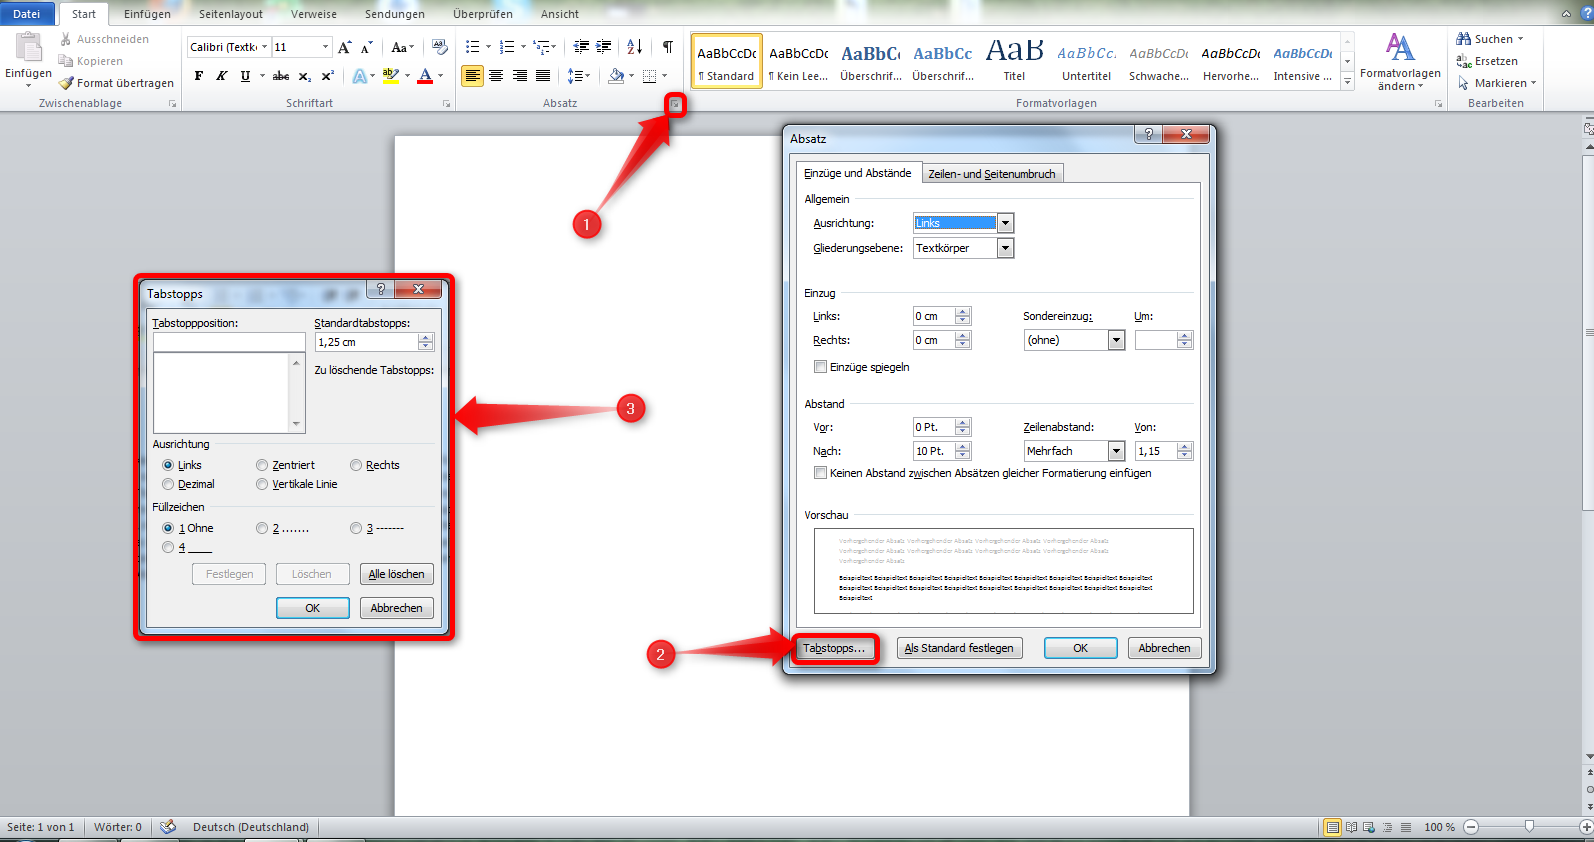 Microsoft-Office-2010-Word-Absatzformatierung-Tabstopp1-470.png?nocache=1308830517106